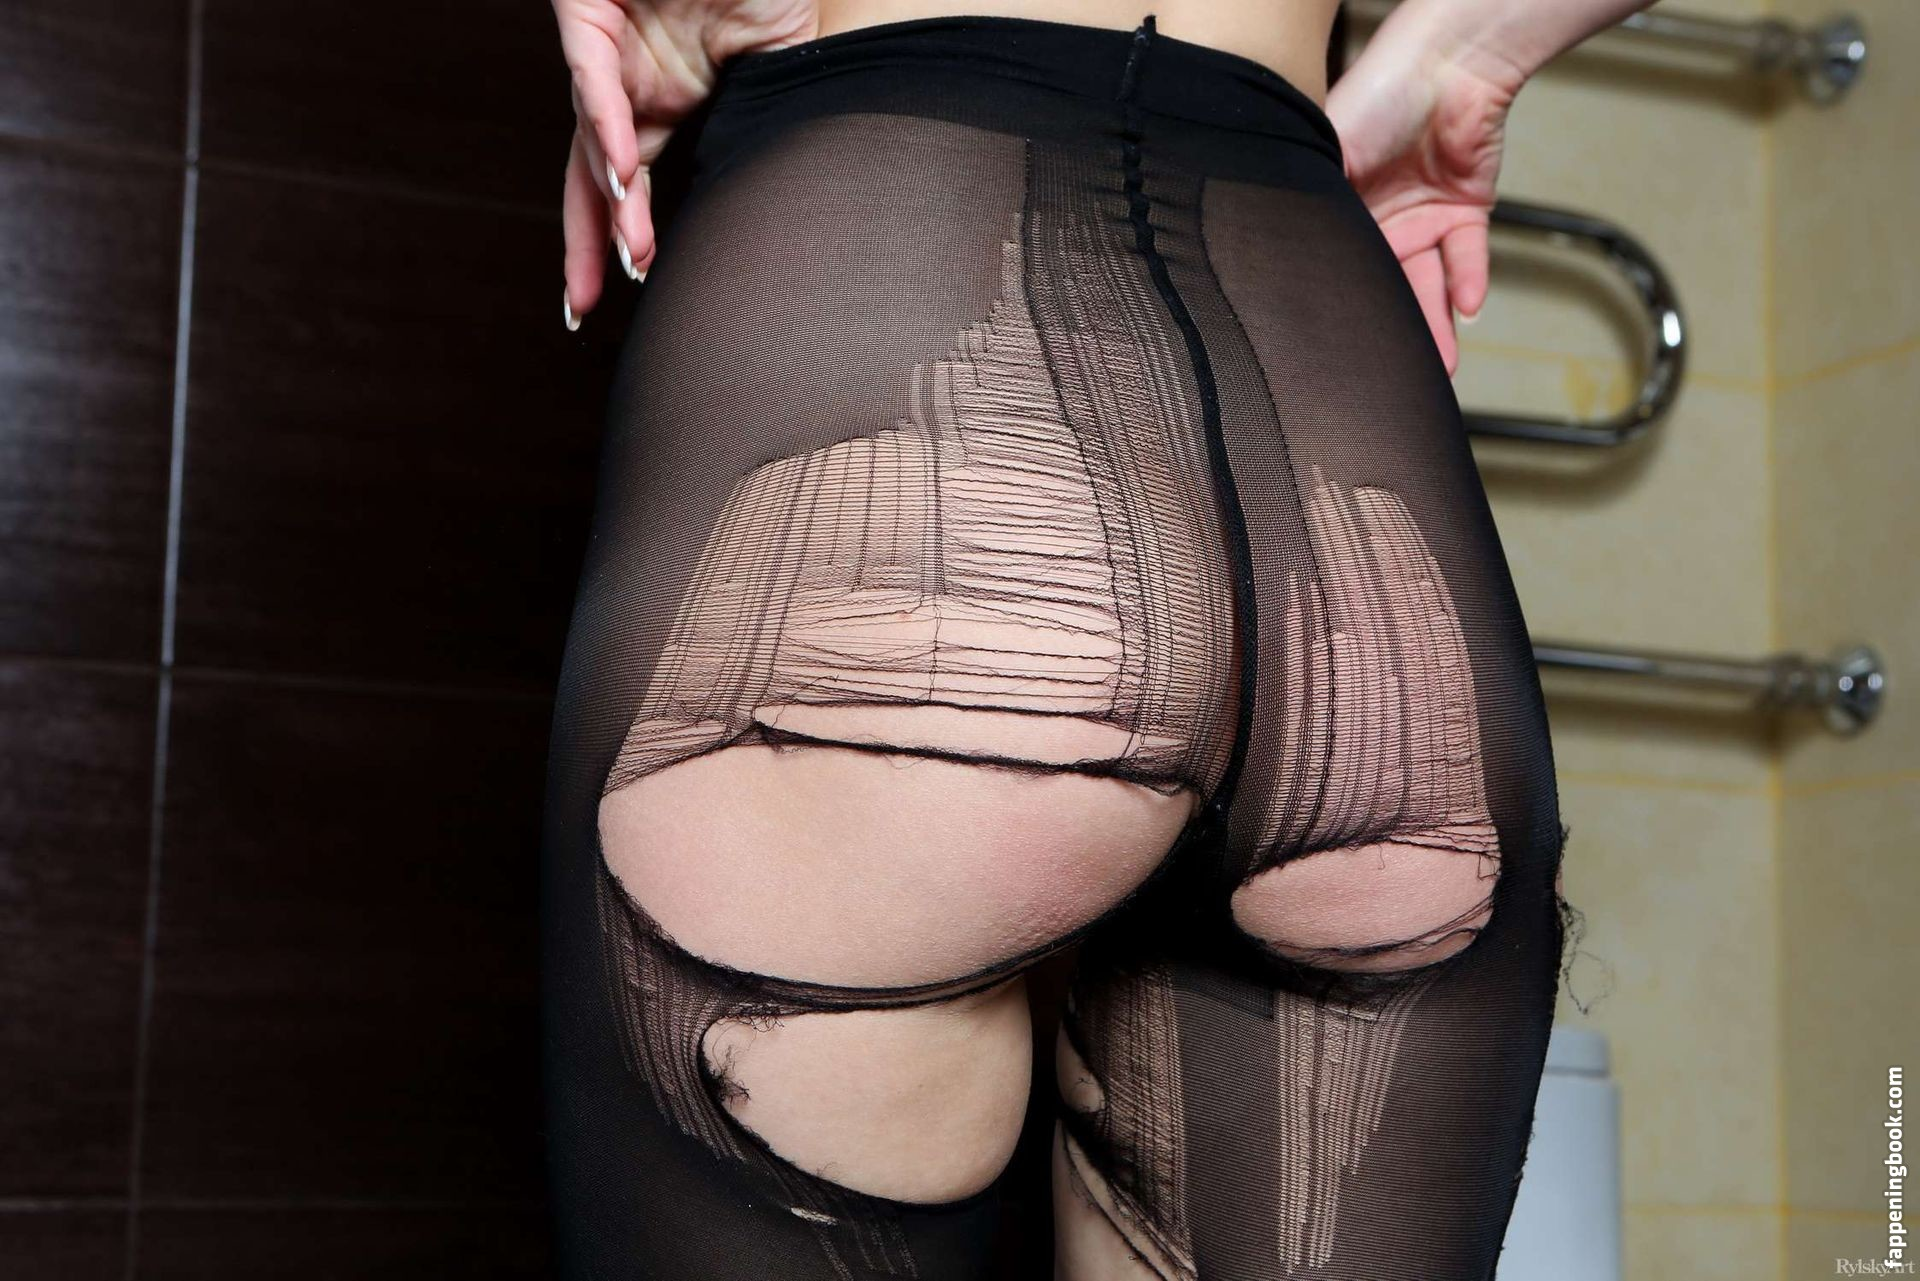 Nikia A Porn nikia a nude, sexy, the fappening, uncensored - photo